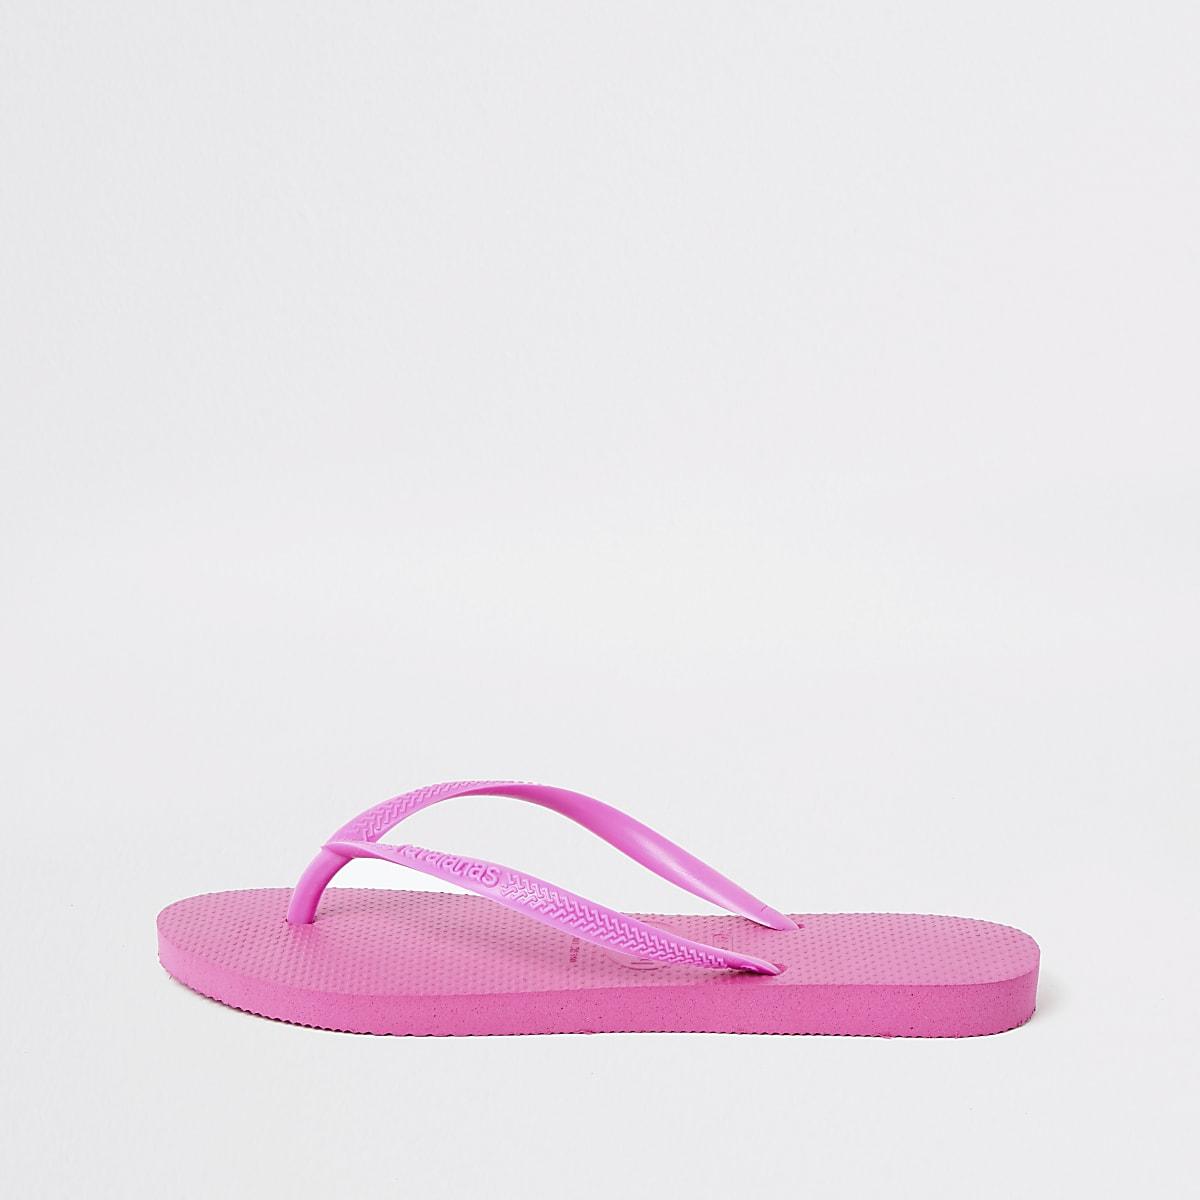 Havaianas bright pink slim flip flops